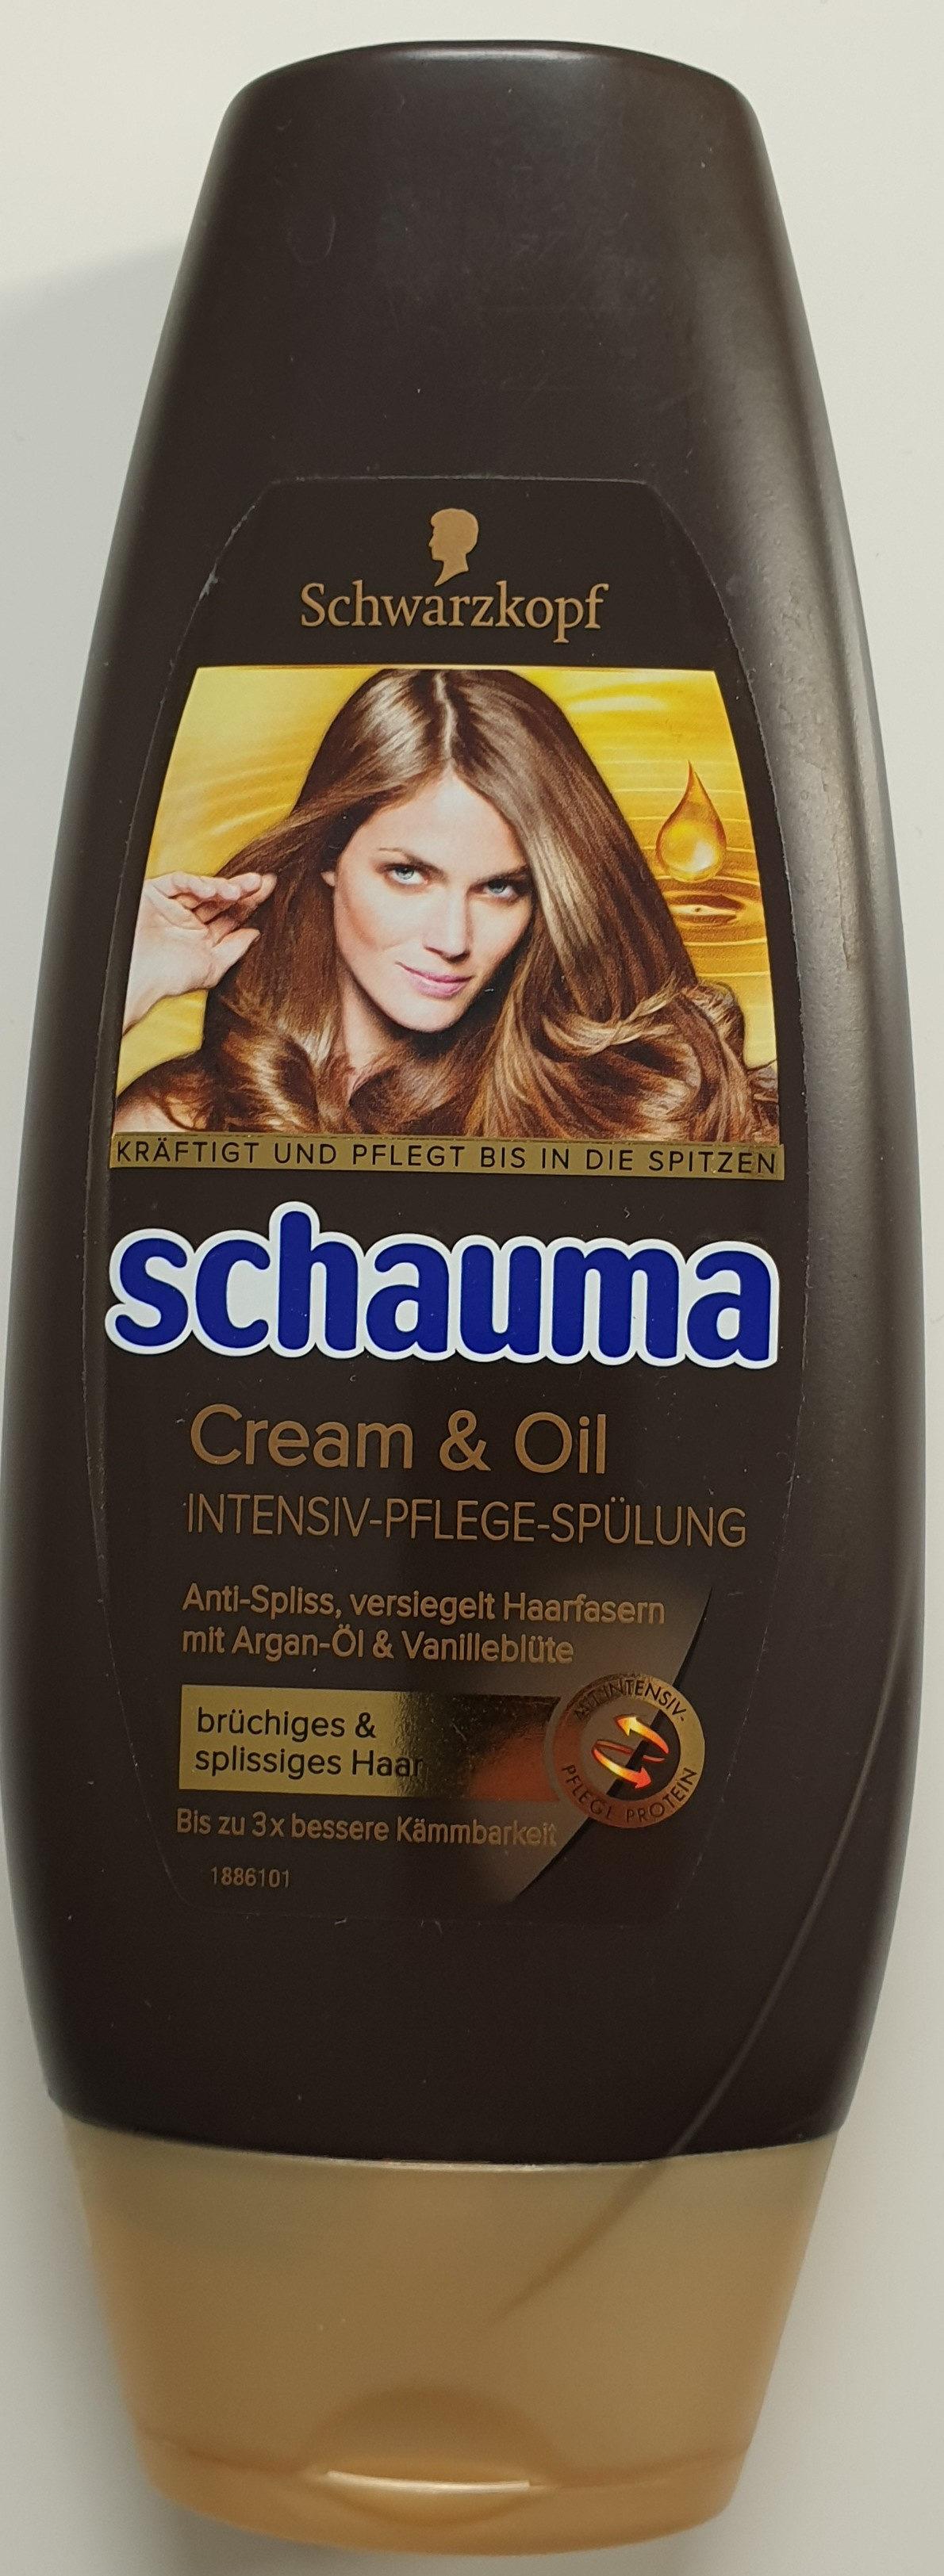 Cream & Oil Intensiv-Pflege-Spülung - Product - de